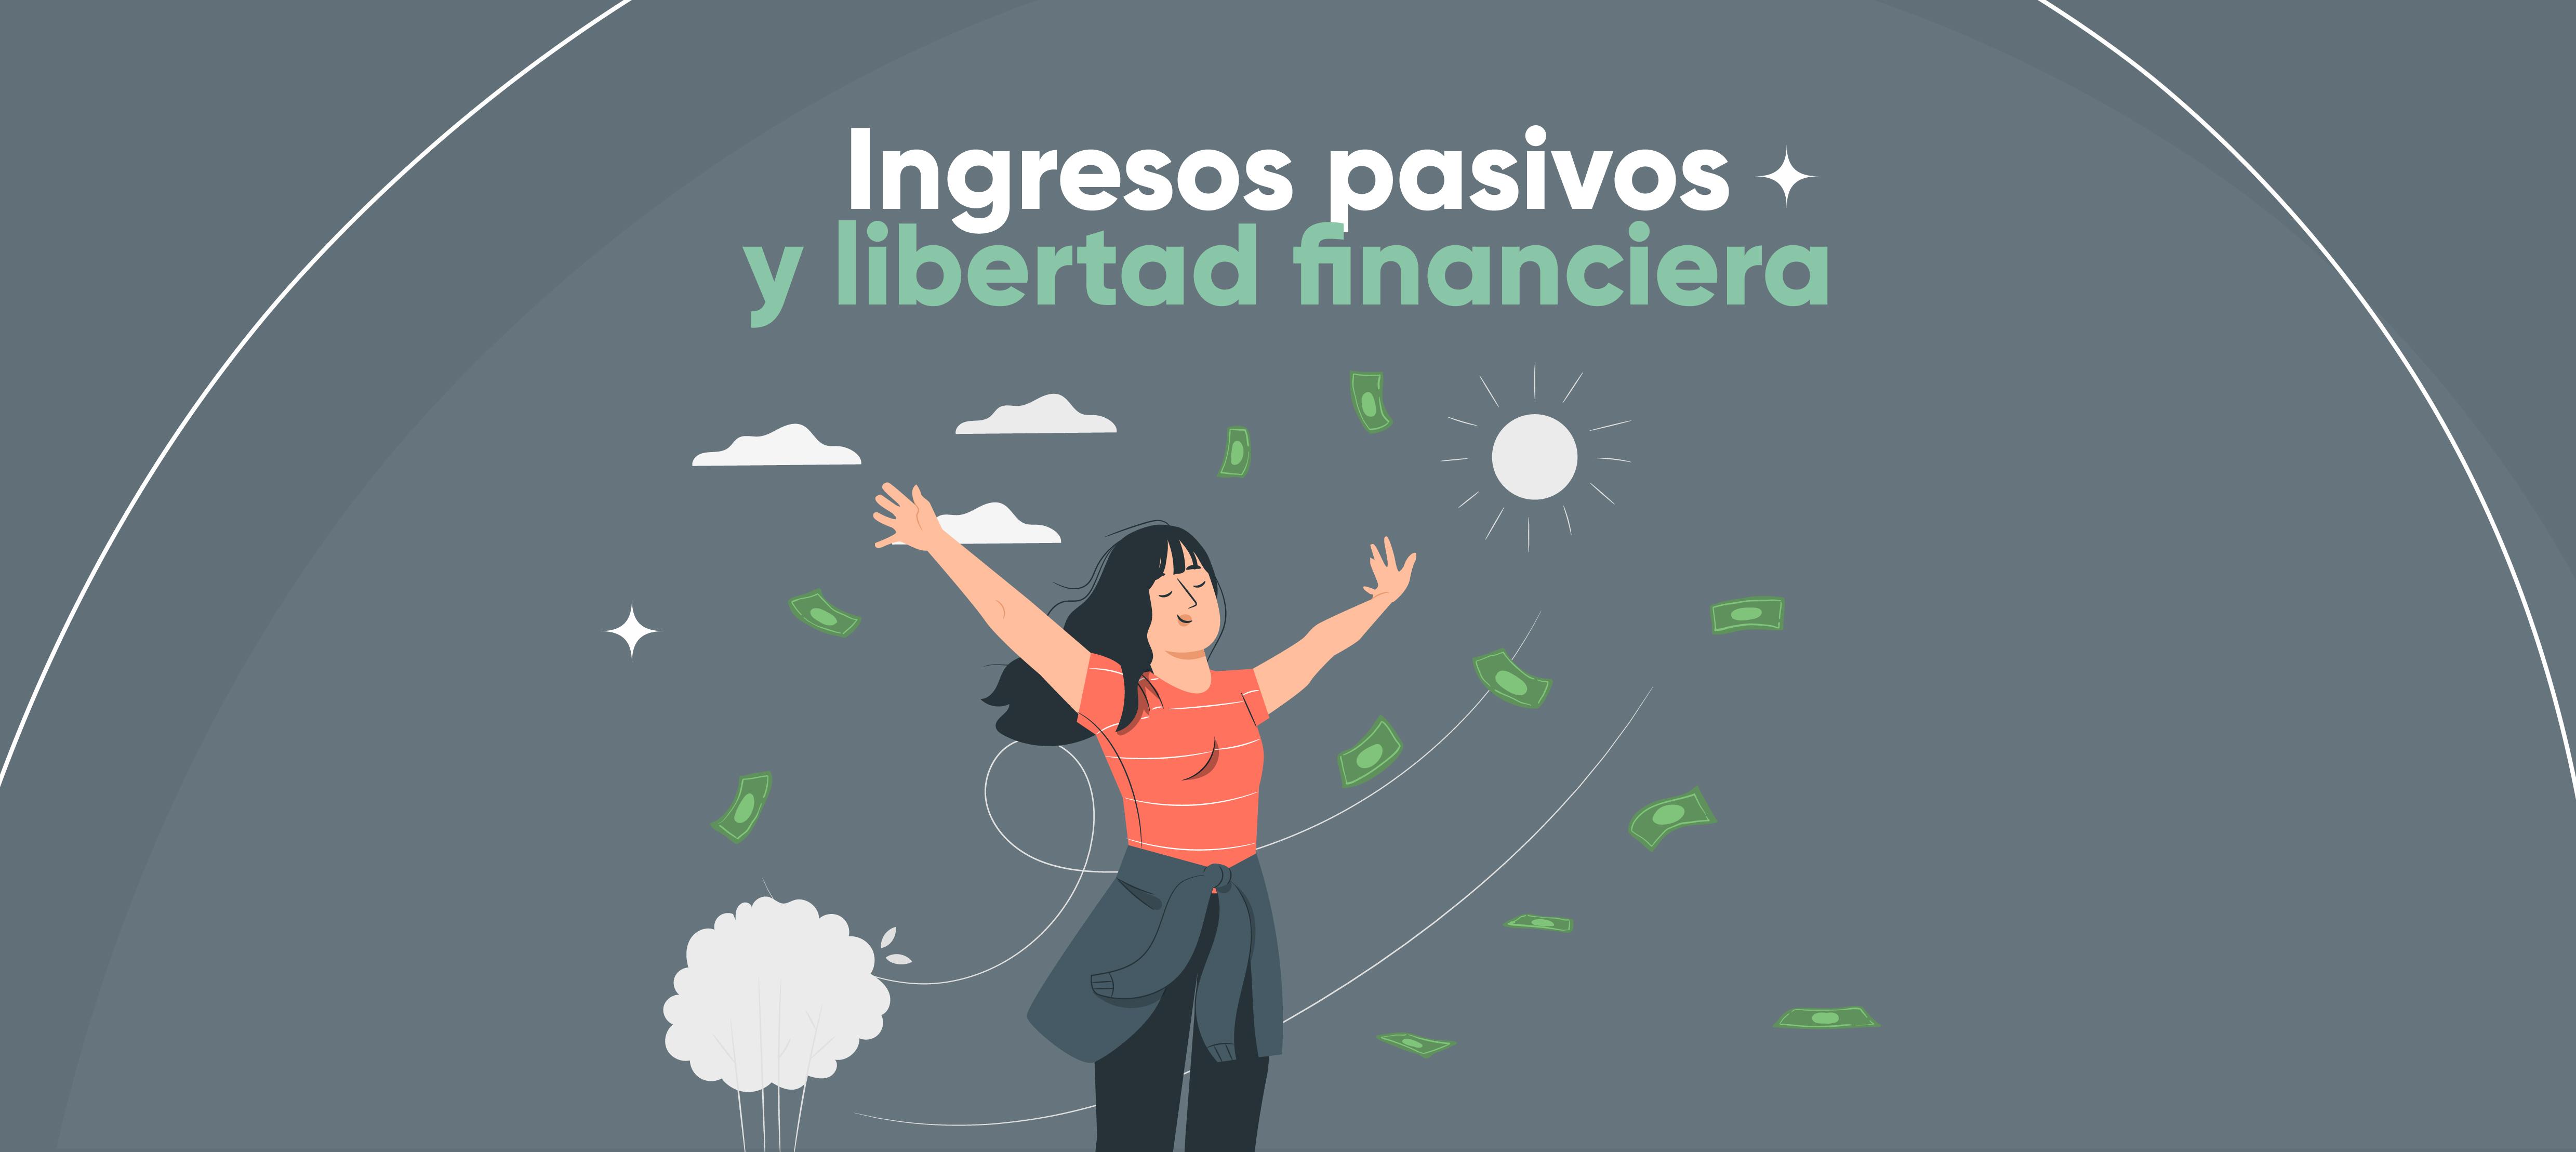 Planea tus finanzas - Tributi